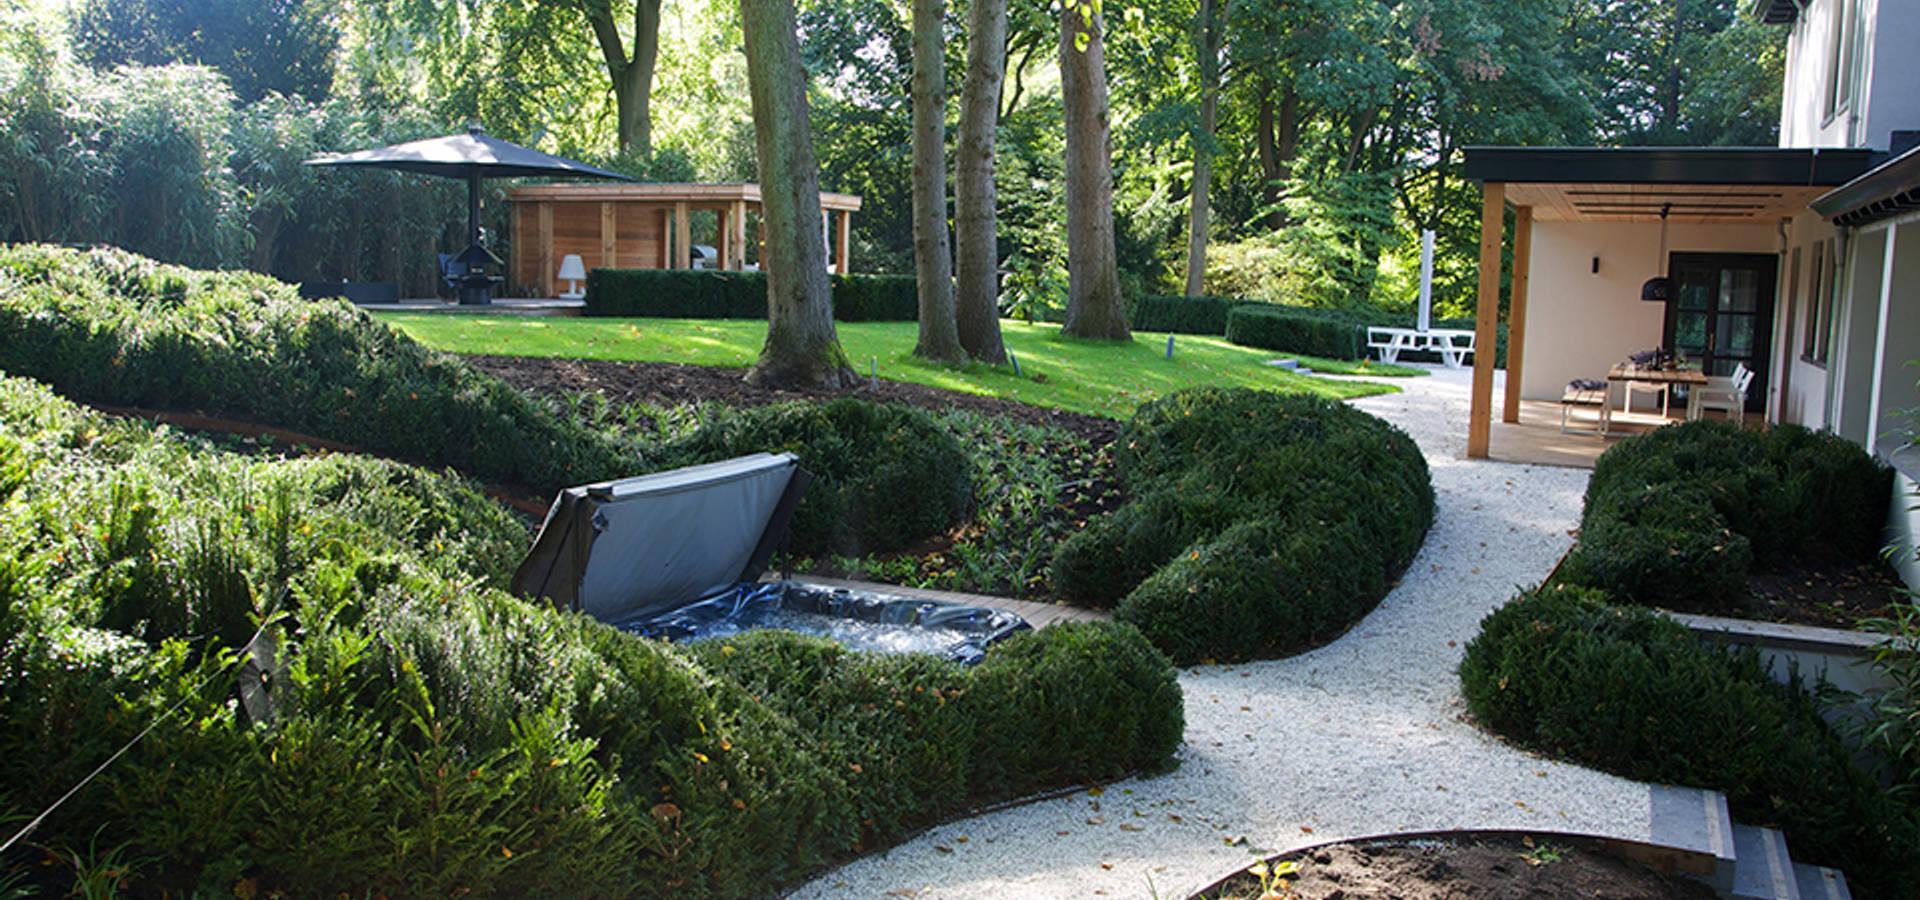 Villa hilversum de designa interieur architectuur bna for Interieur architectuur